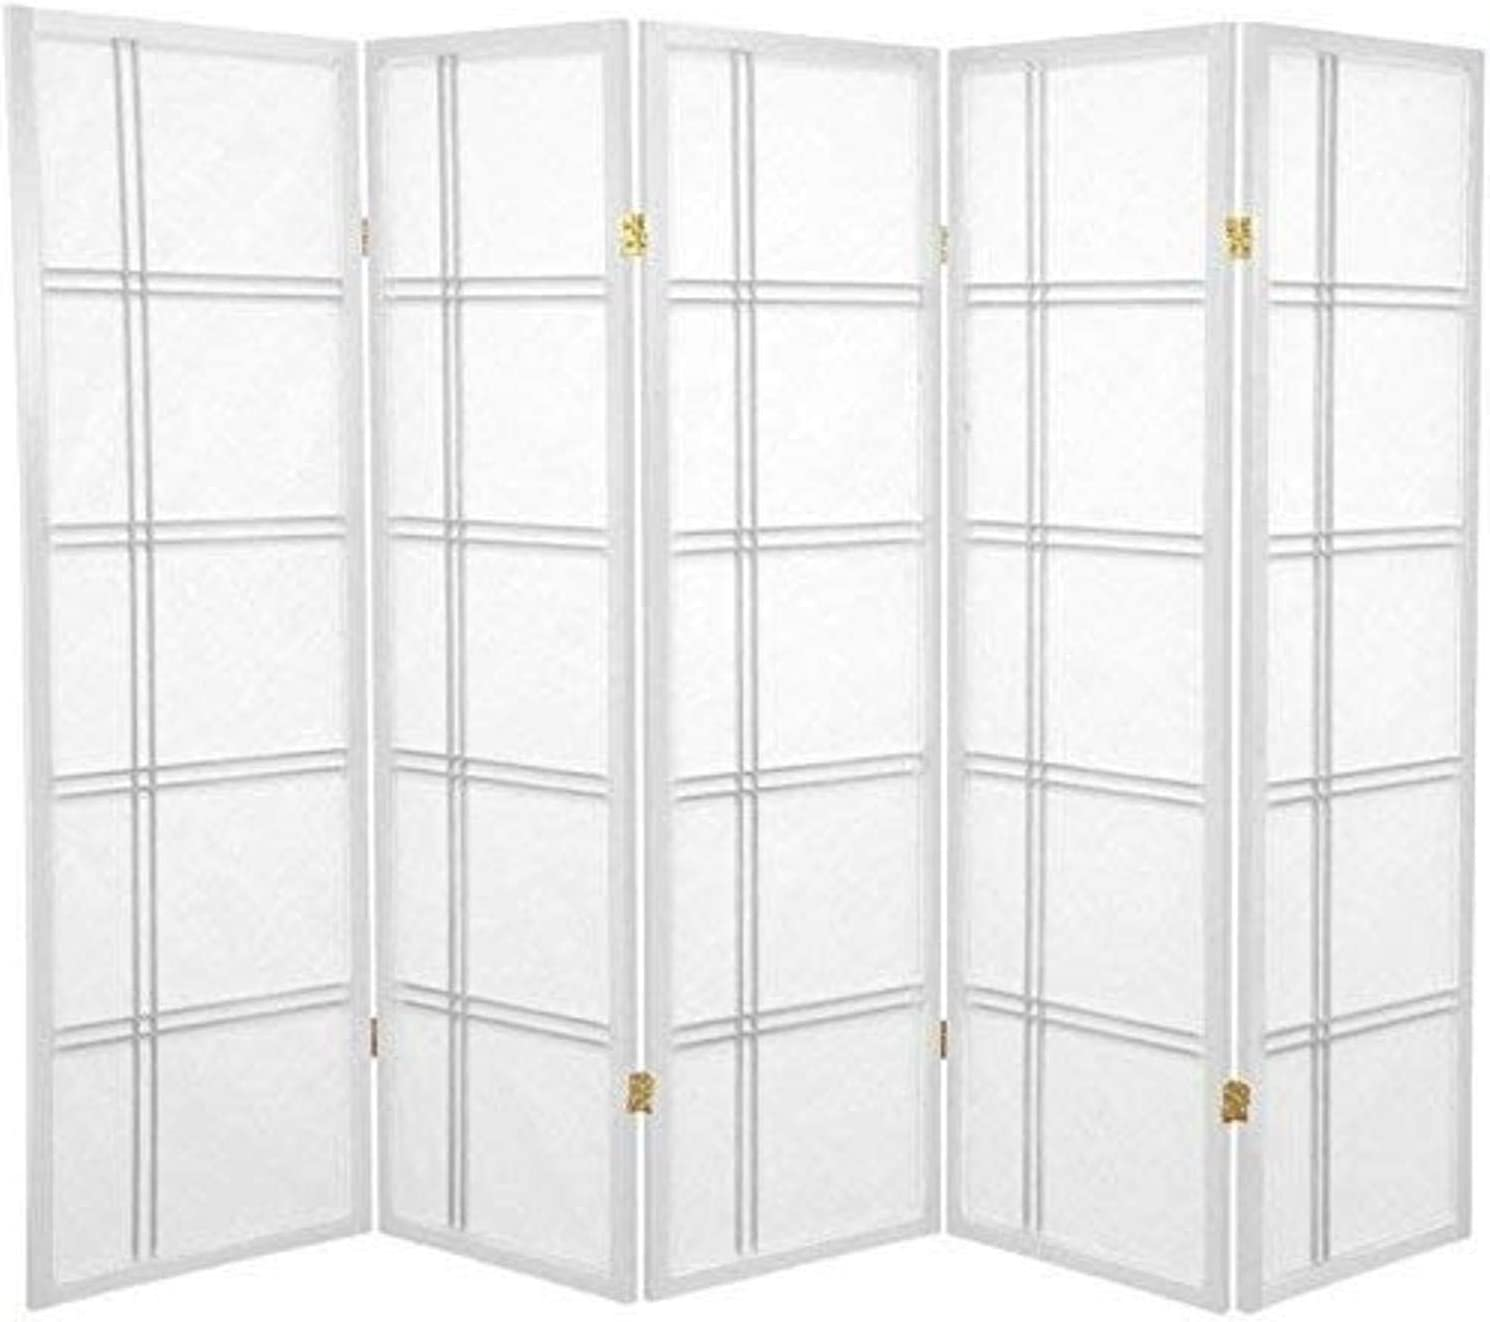 Oriental Furniture 5 ft. Tall Double Cross Shoji Screen - White - 5 Panels